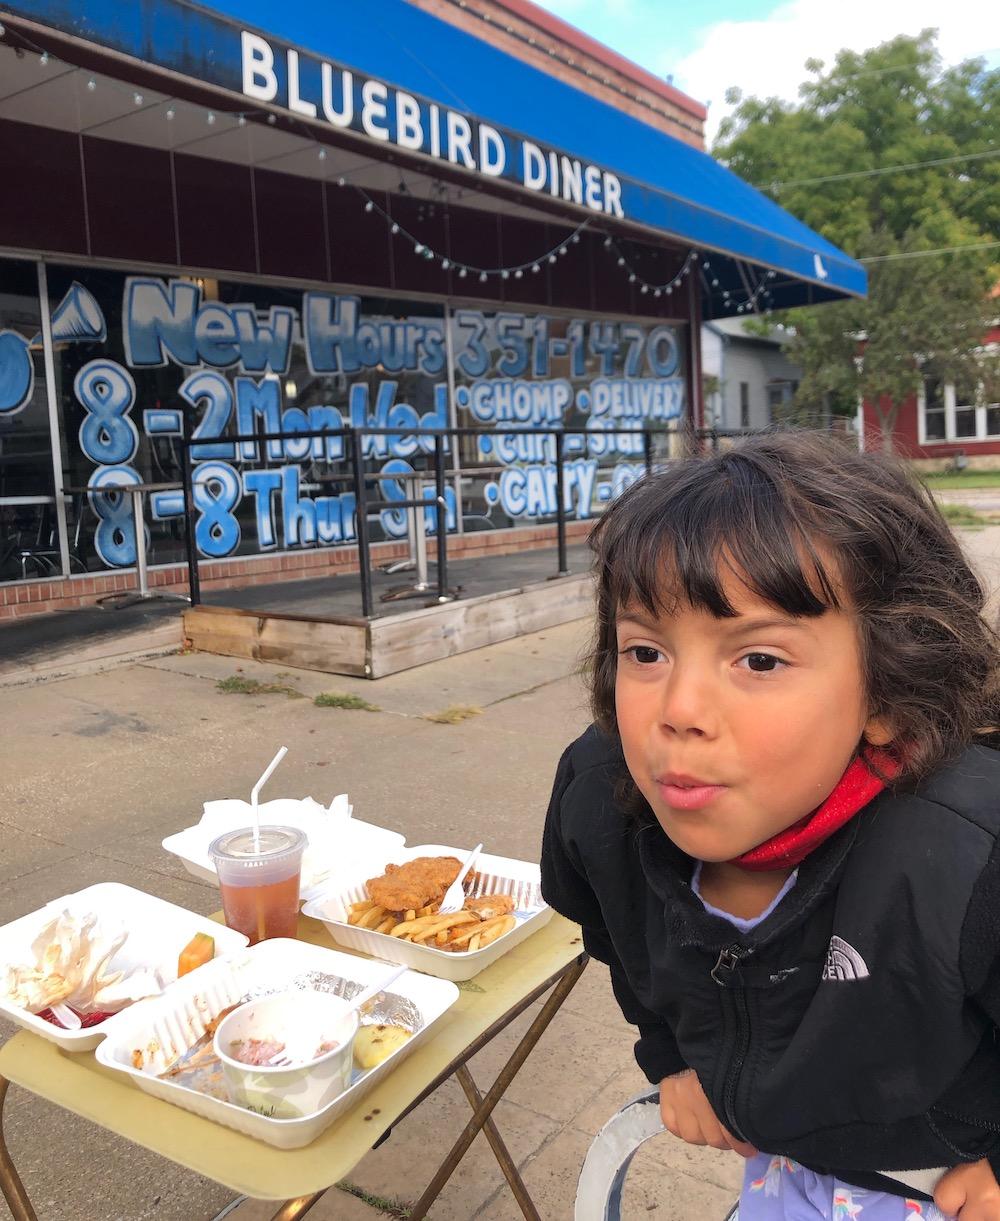 Bluebird Diner, Iowa City